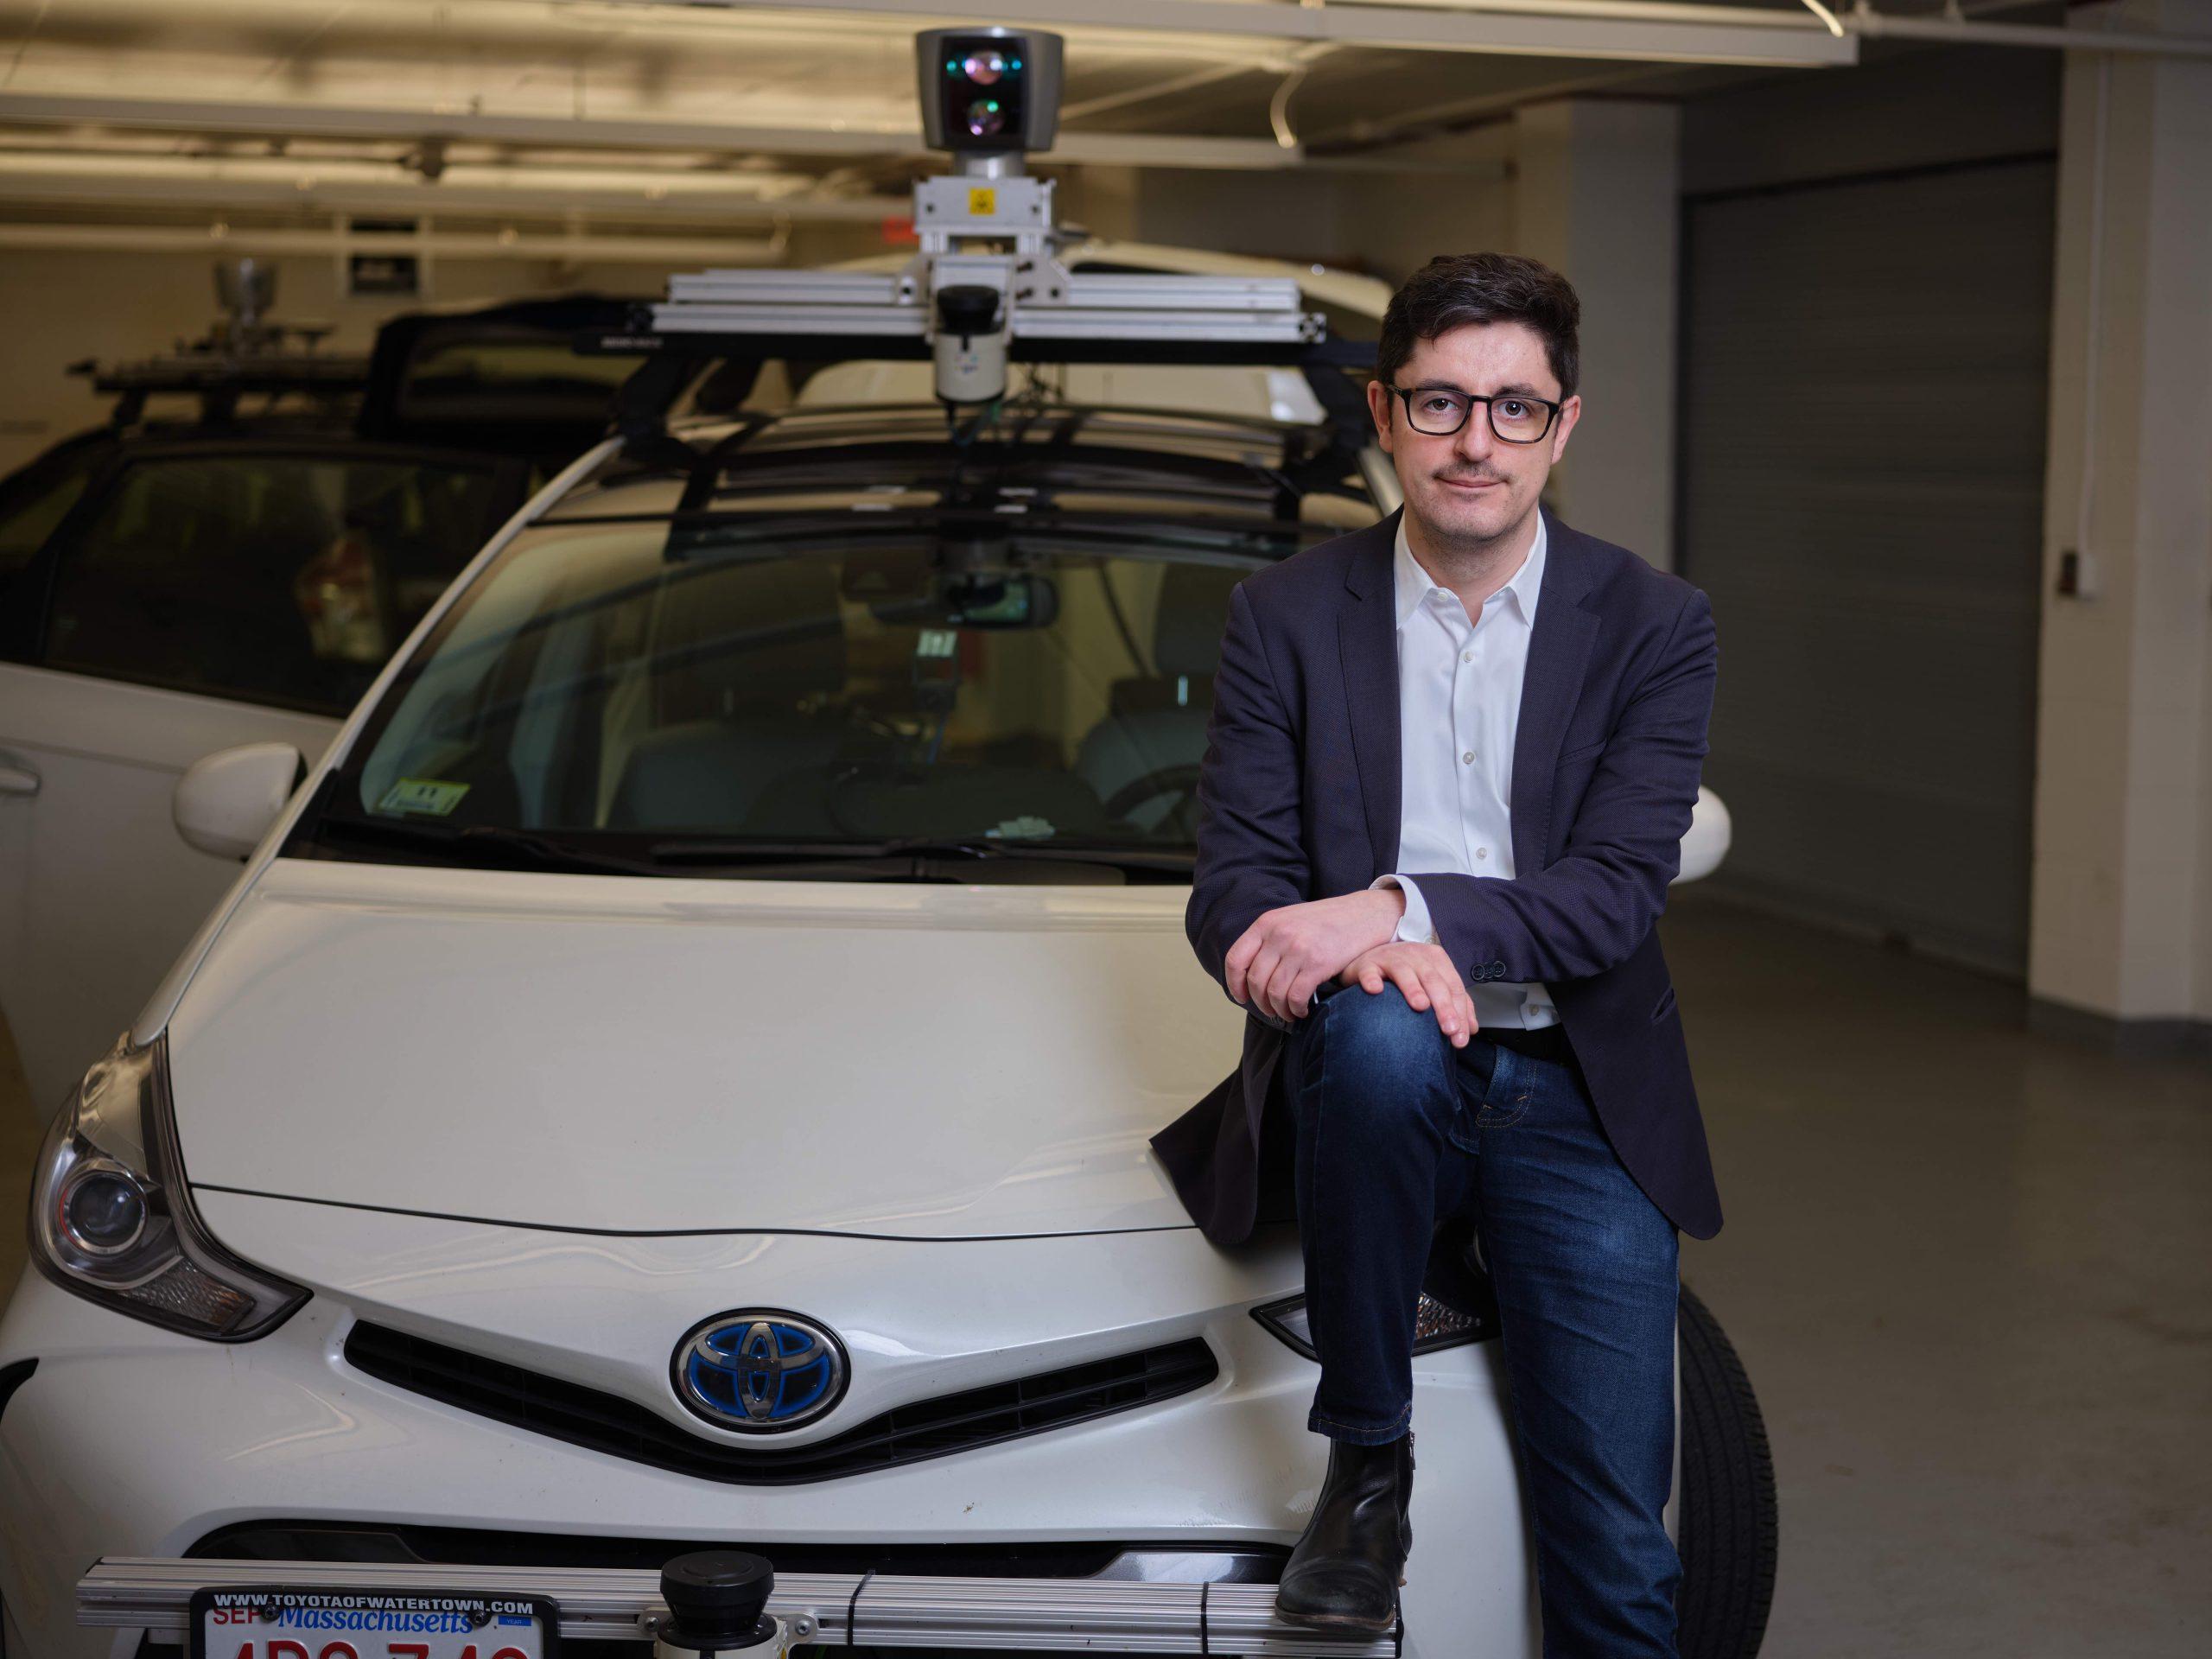 igor_gilitschenski_autonomous_car